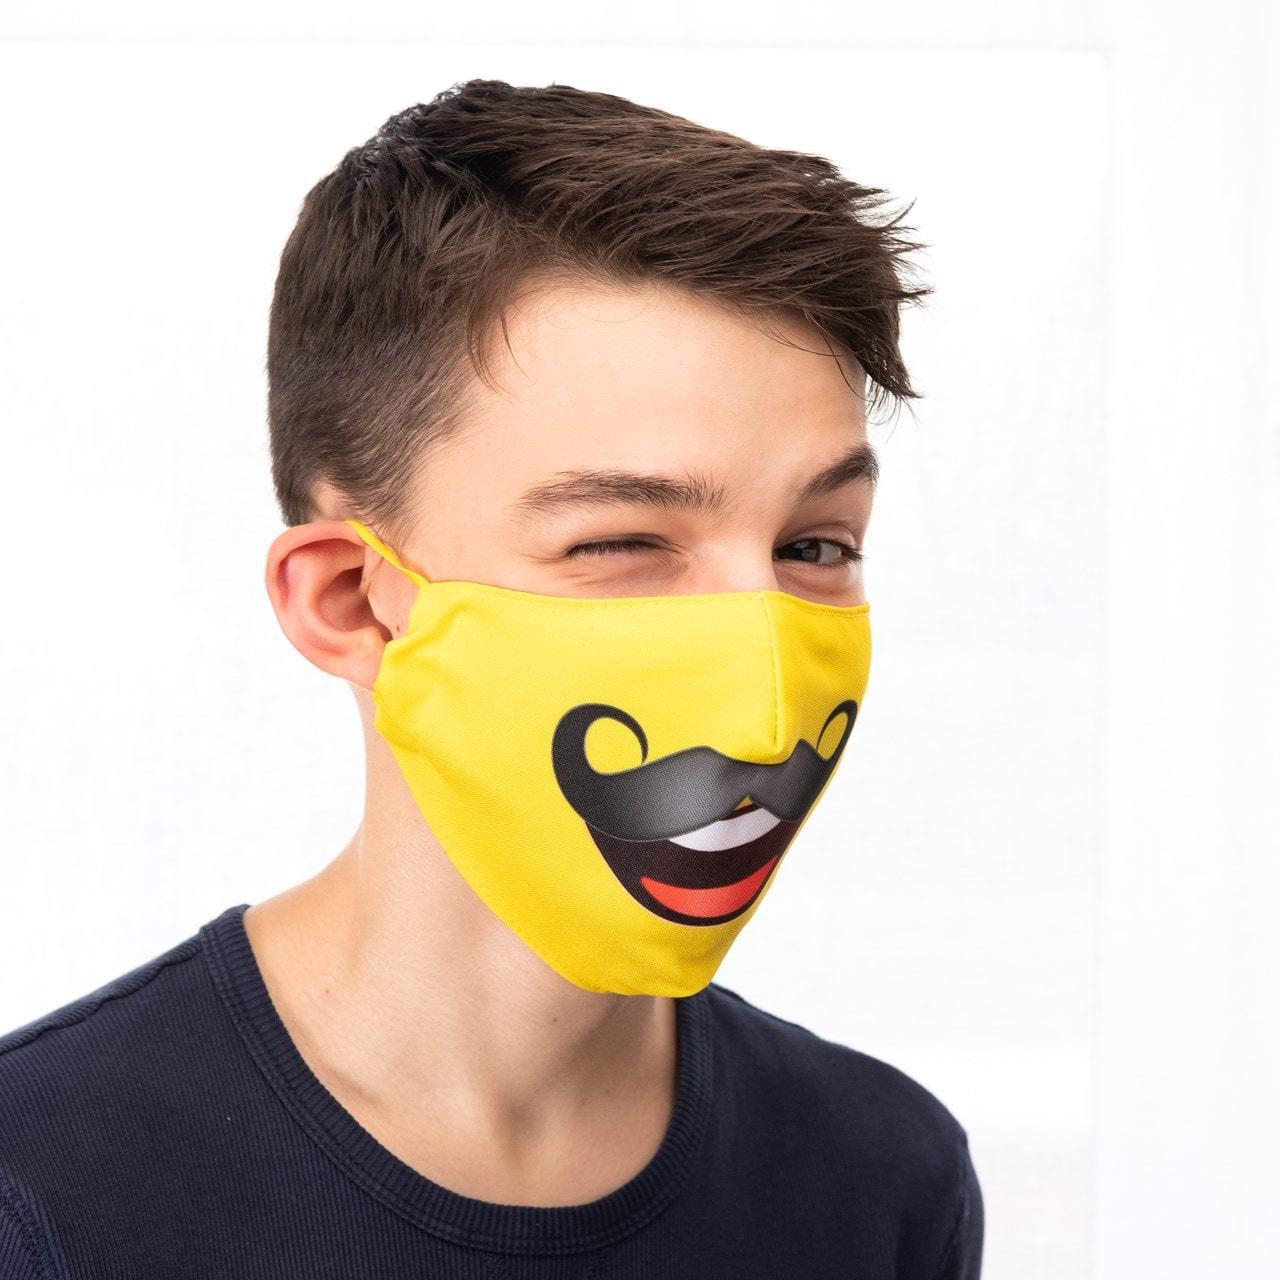 Moustache Emoji Face Covering - 2